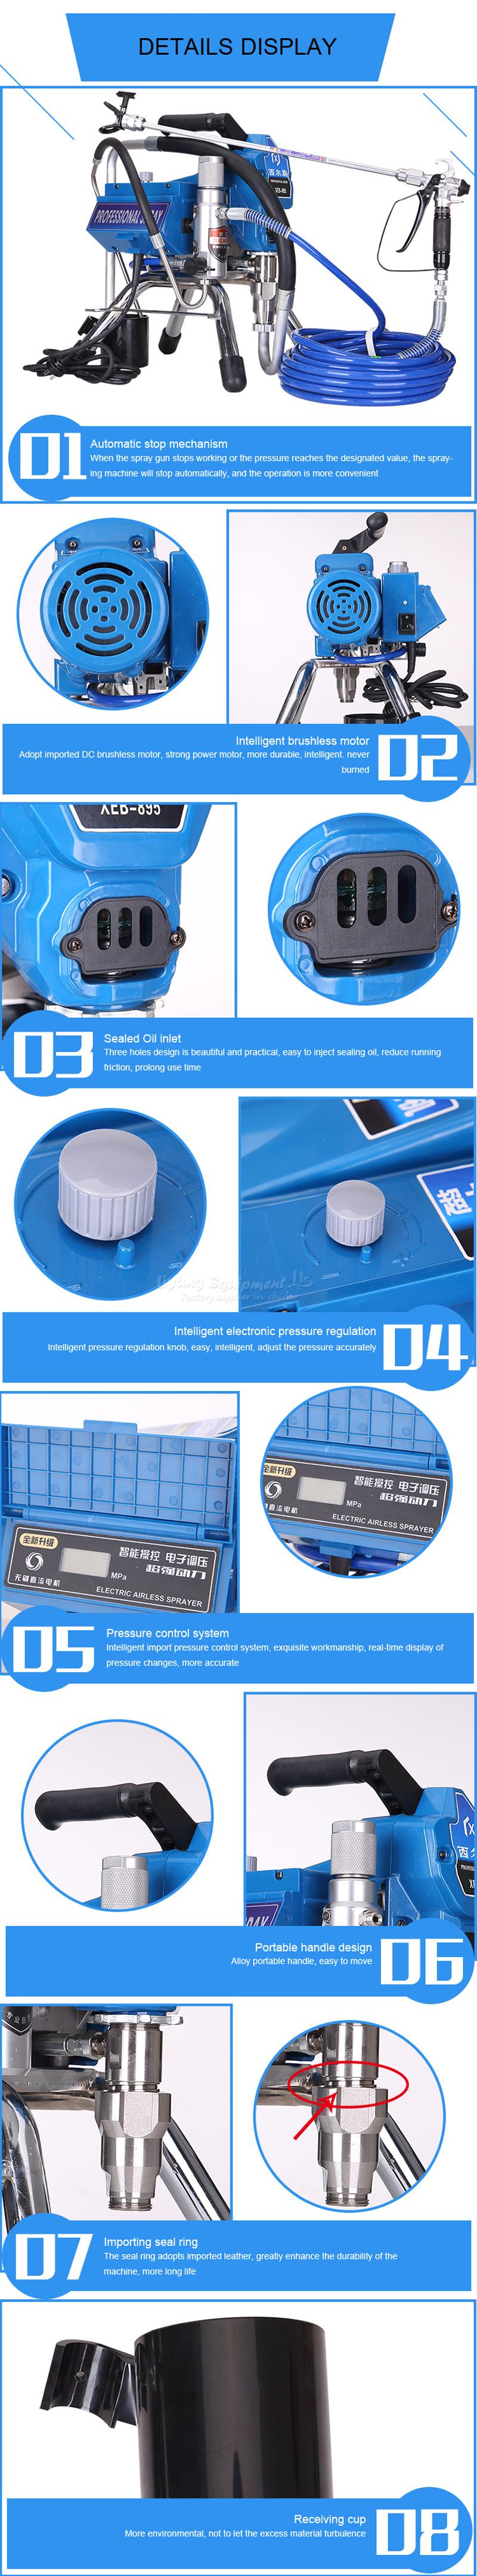 electric airless sprayer (6)